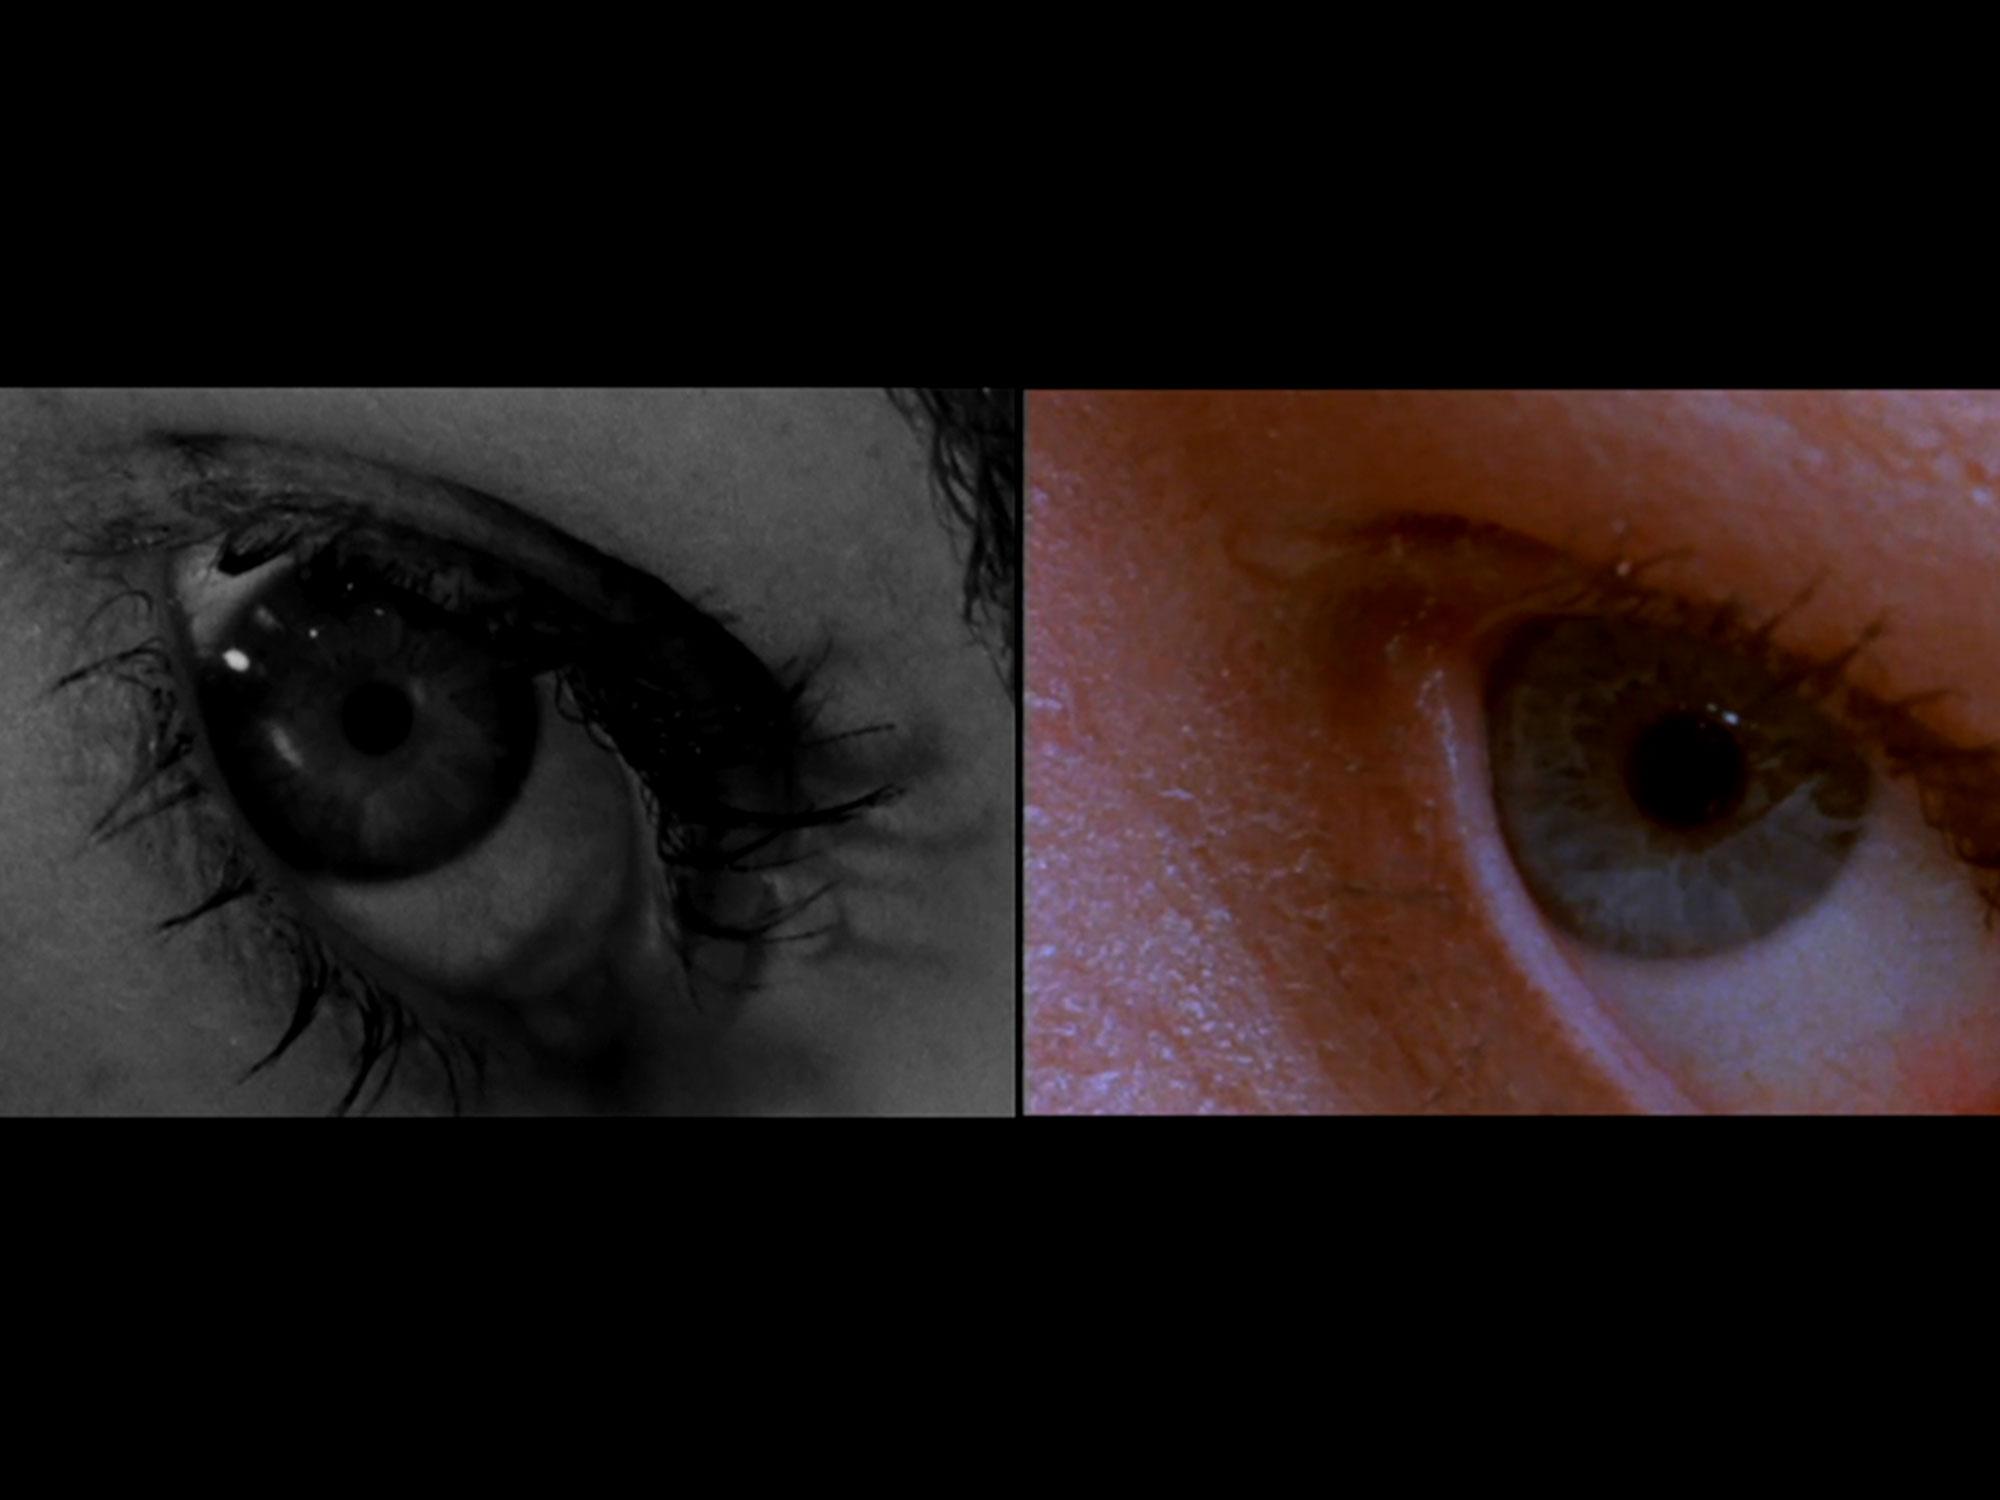 Psycho vs Psycho – Hitchcock's classic vs Gus Van Sant's remake